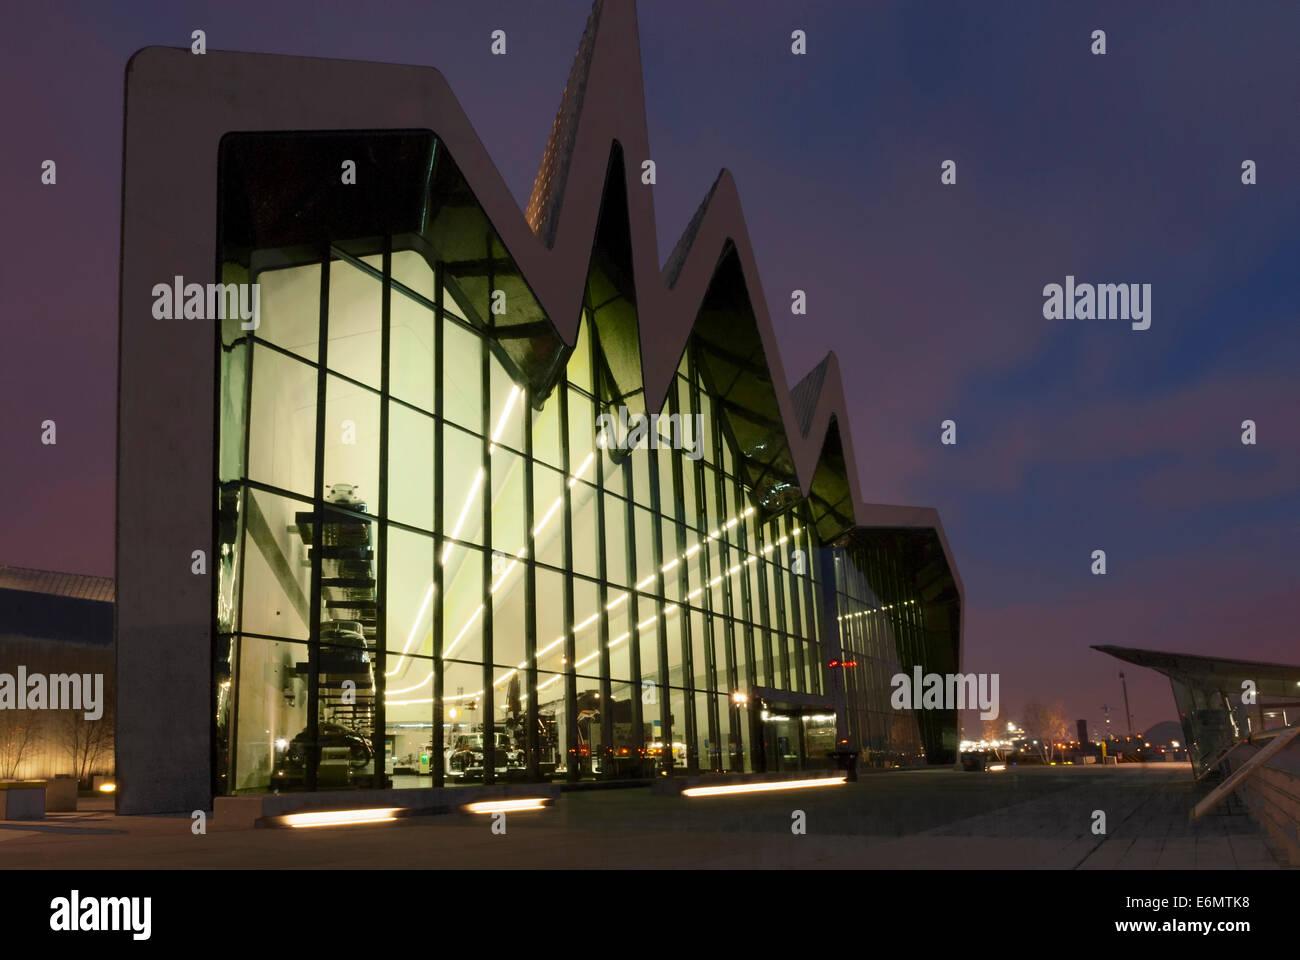 Night photograph of the Riverside Museum of Transport in Glasgow Scotland UK Architect Zaha Hadid. - Stock Image